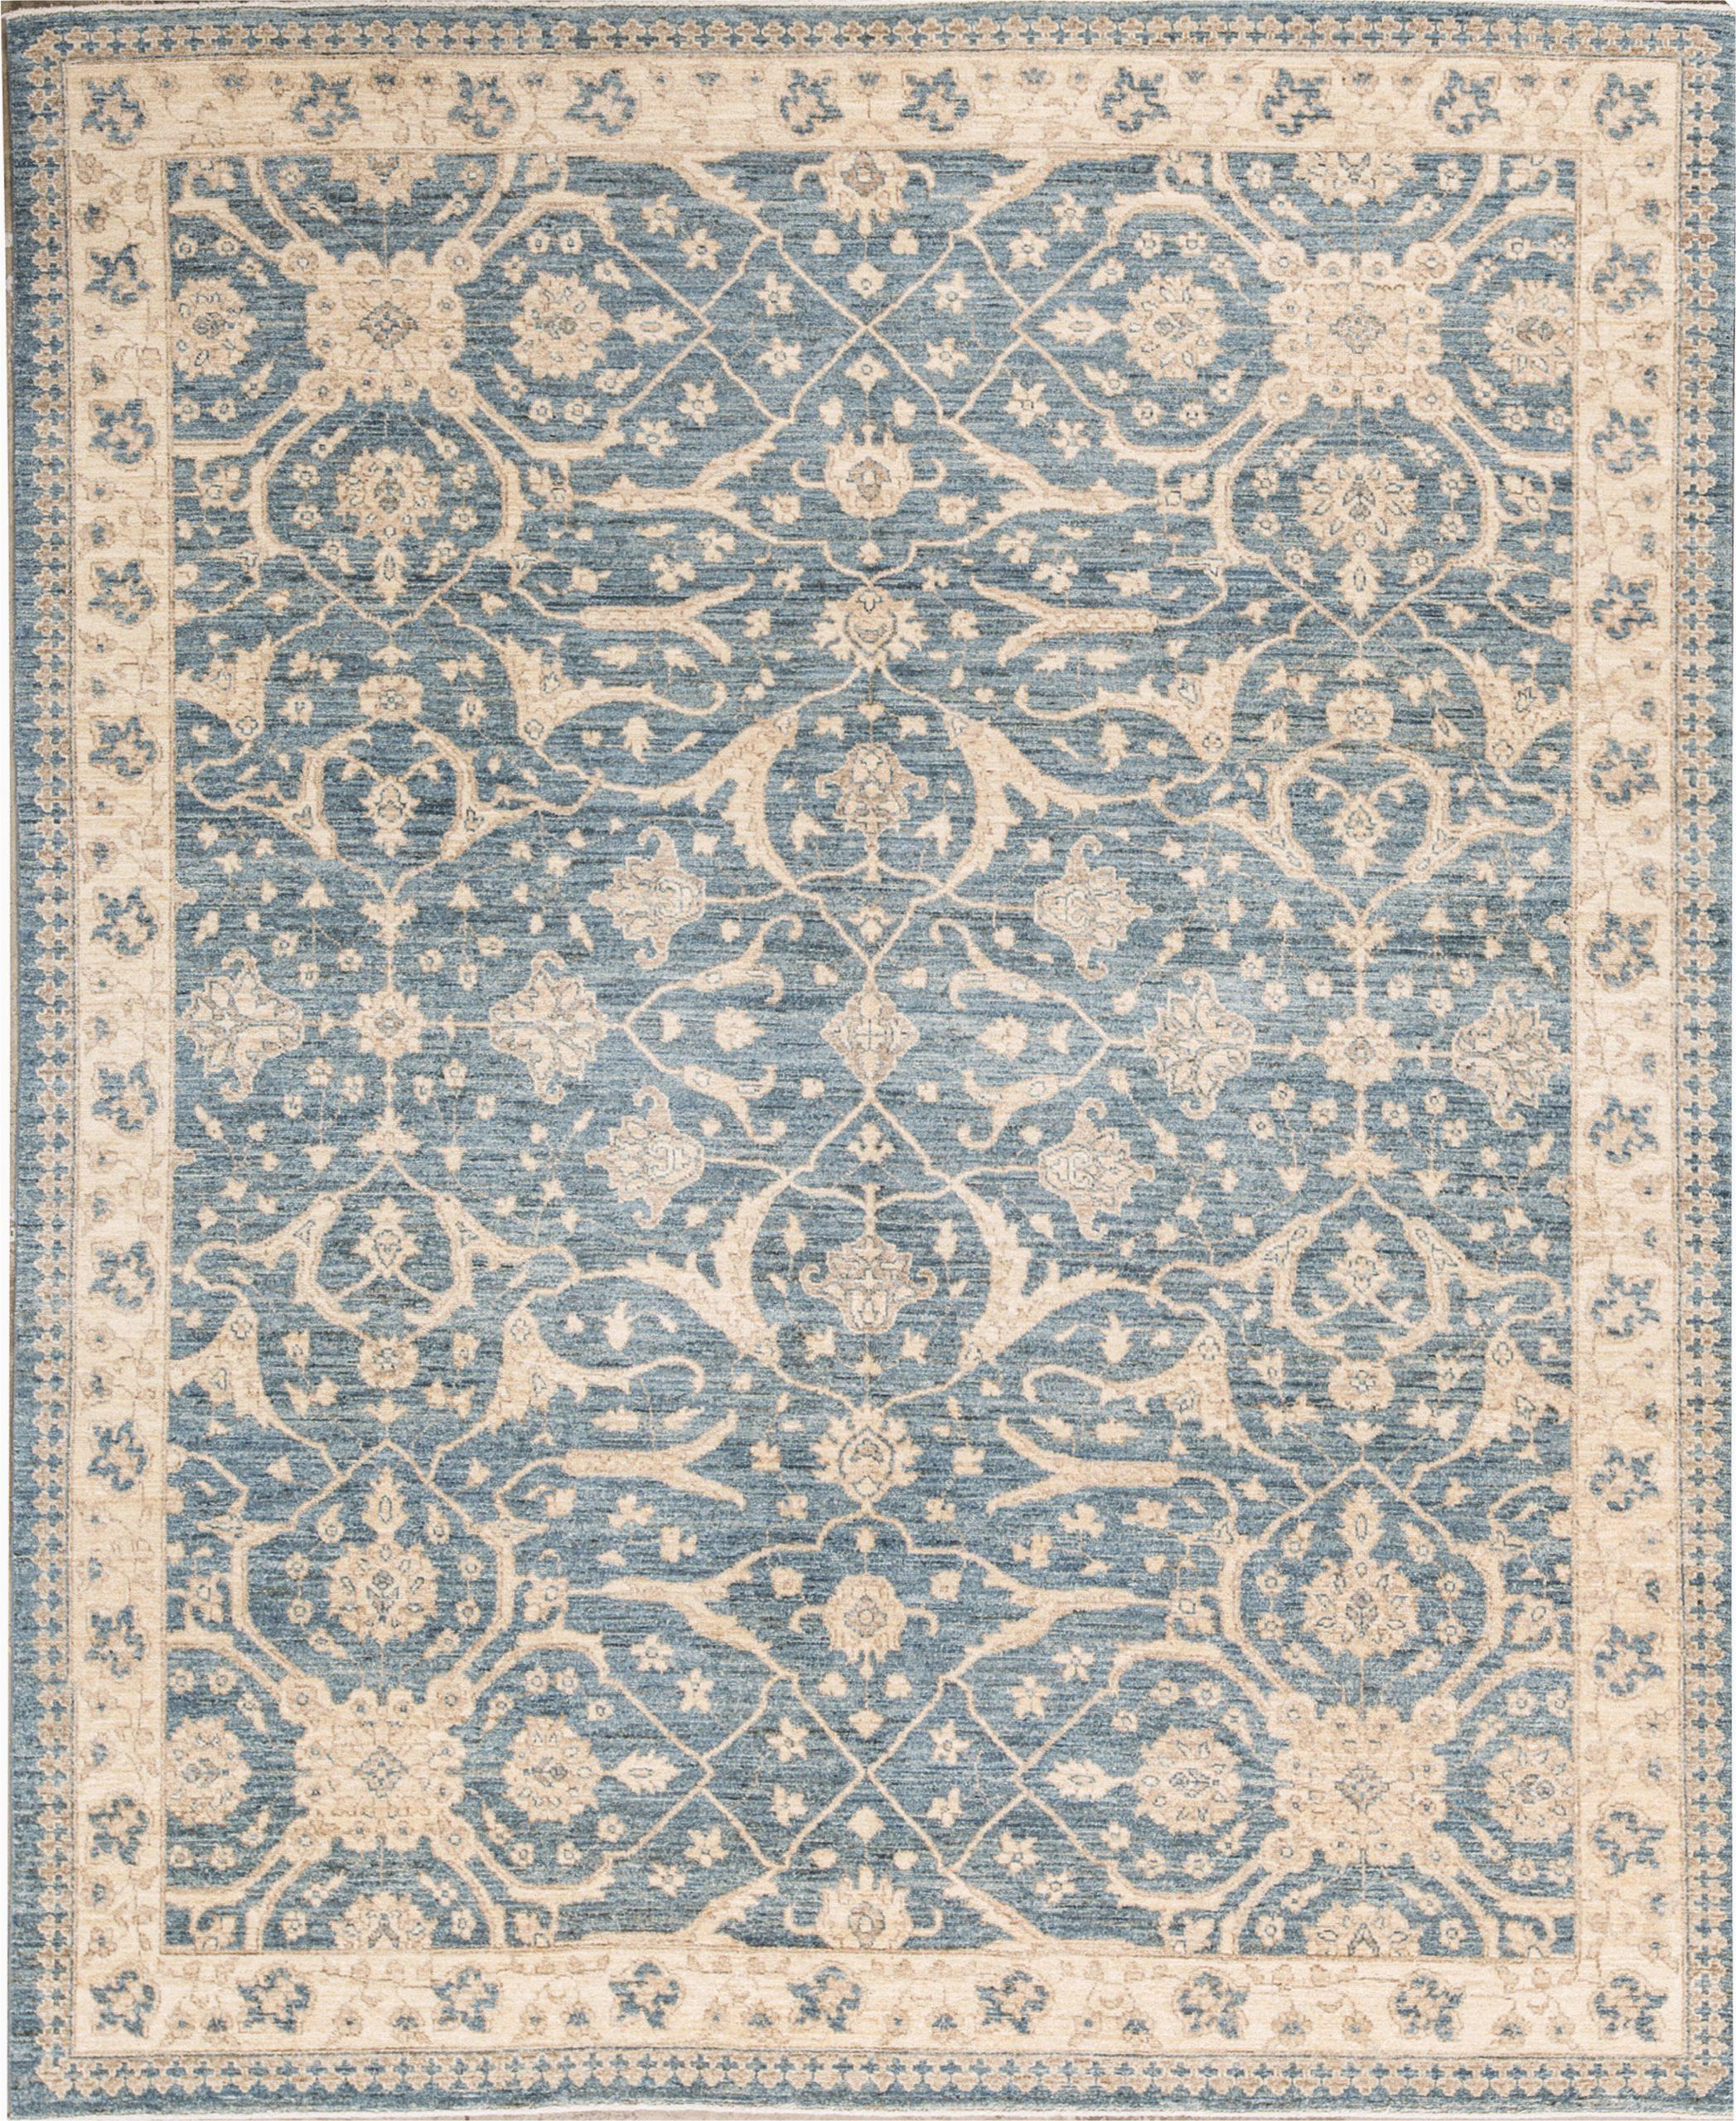 sultanabad oriental hand knotted wool light bluecream area rug